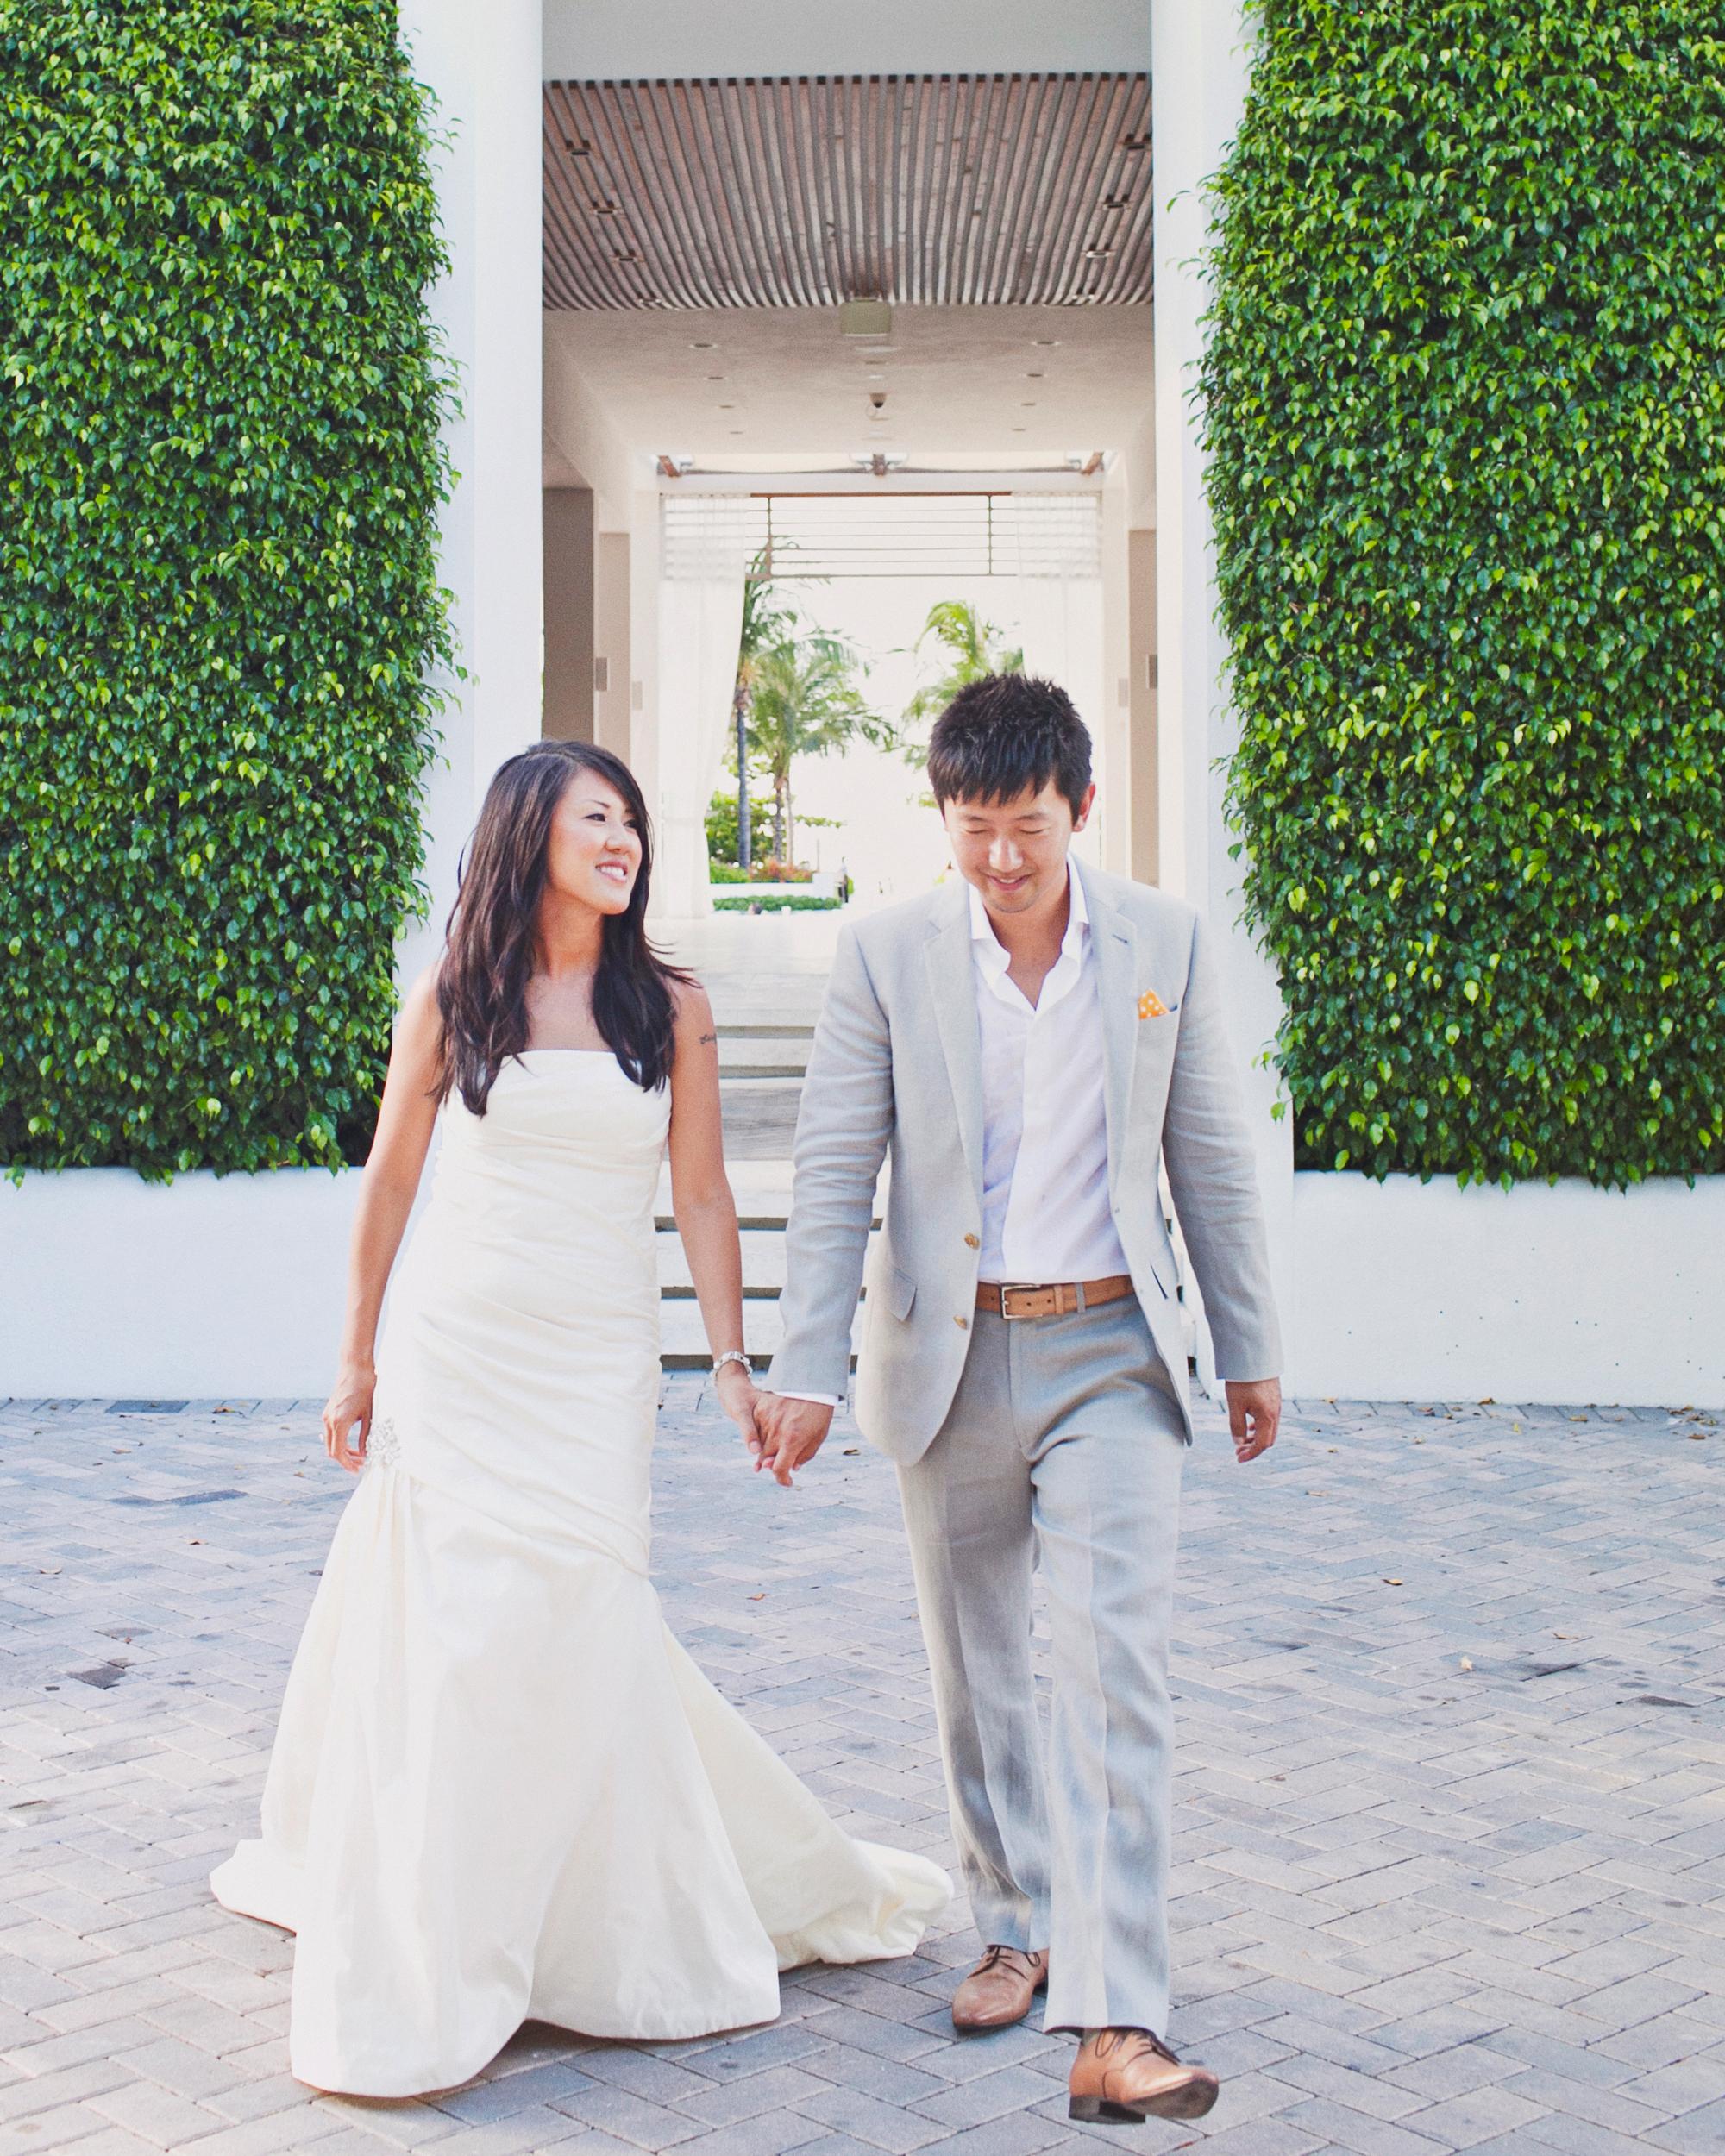 real-weddings-jessica-bobby-0811-261.jpg